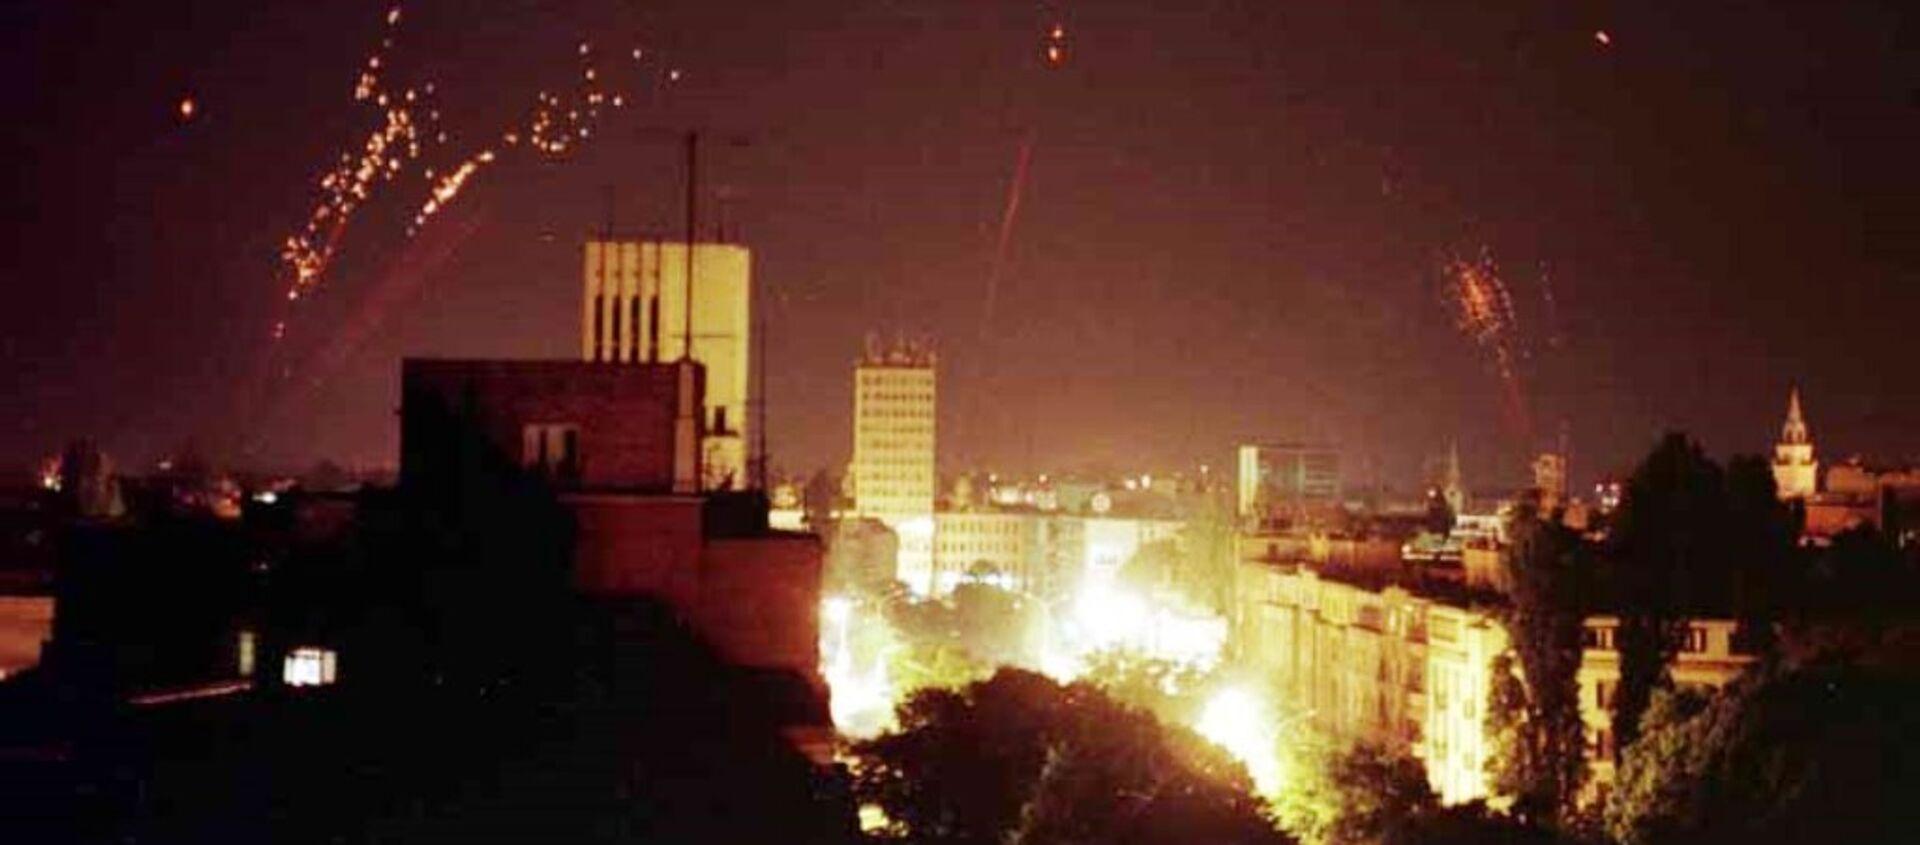 La defensa aérea de Yugoslavia intenta derribar los bombarderos de la OTAN - Sputnik Mundo, 1920, 24.03.2019